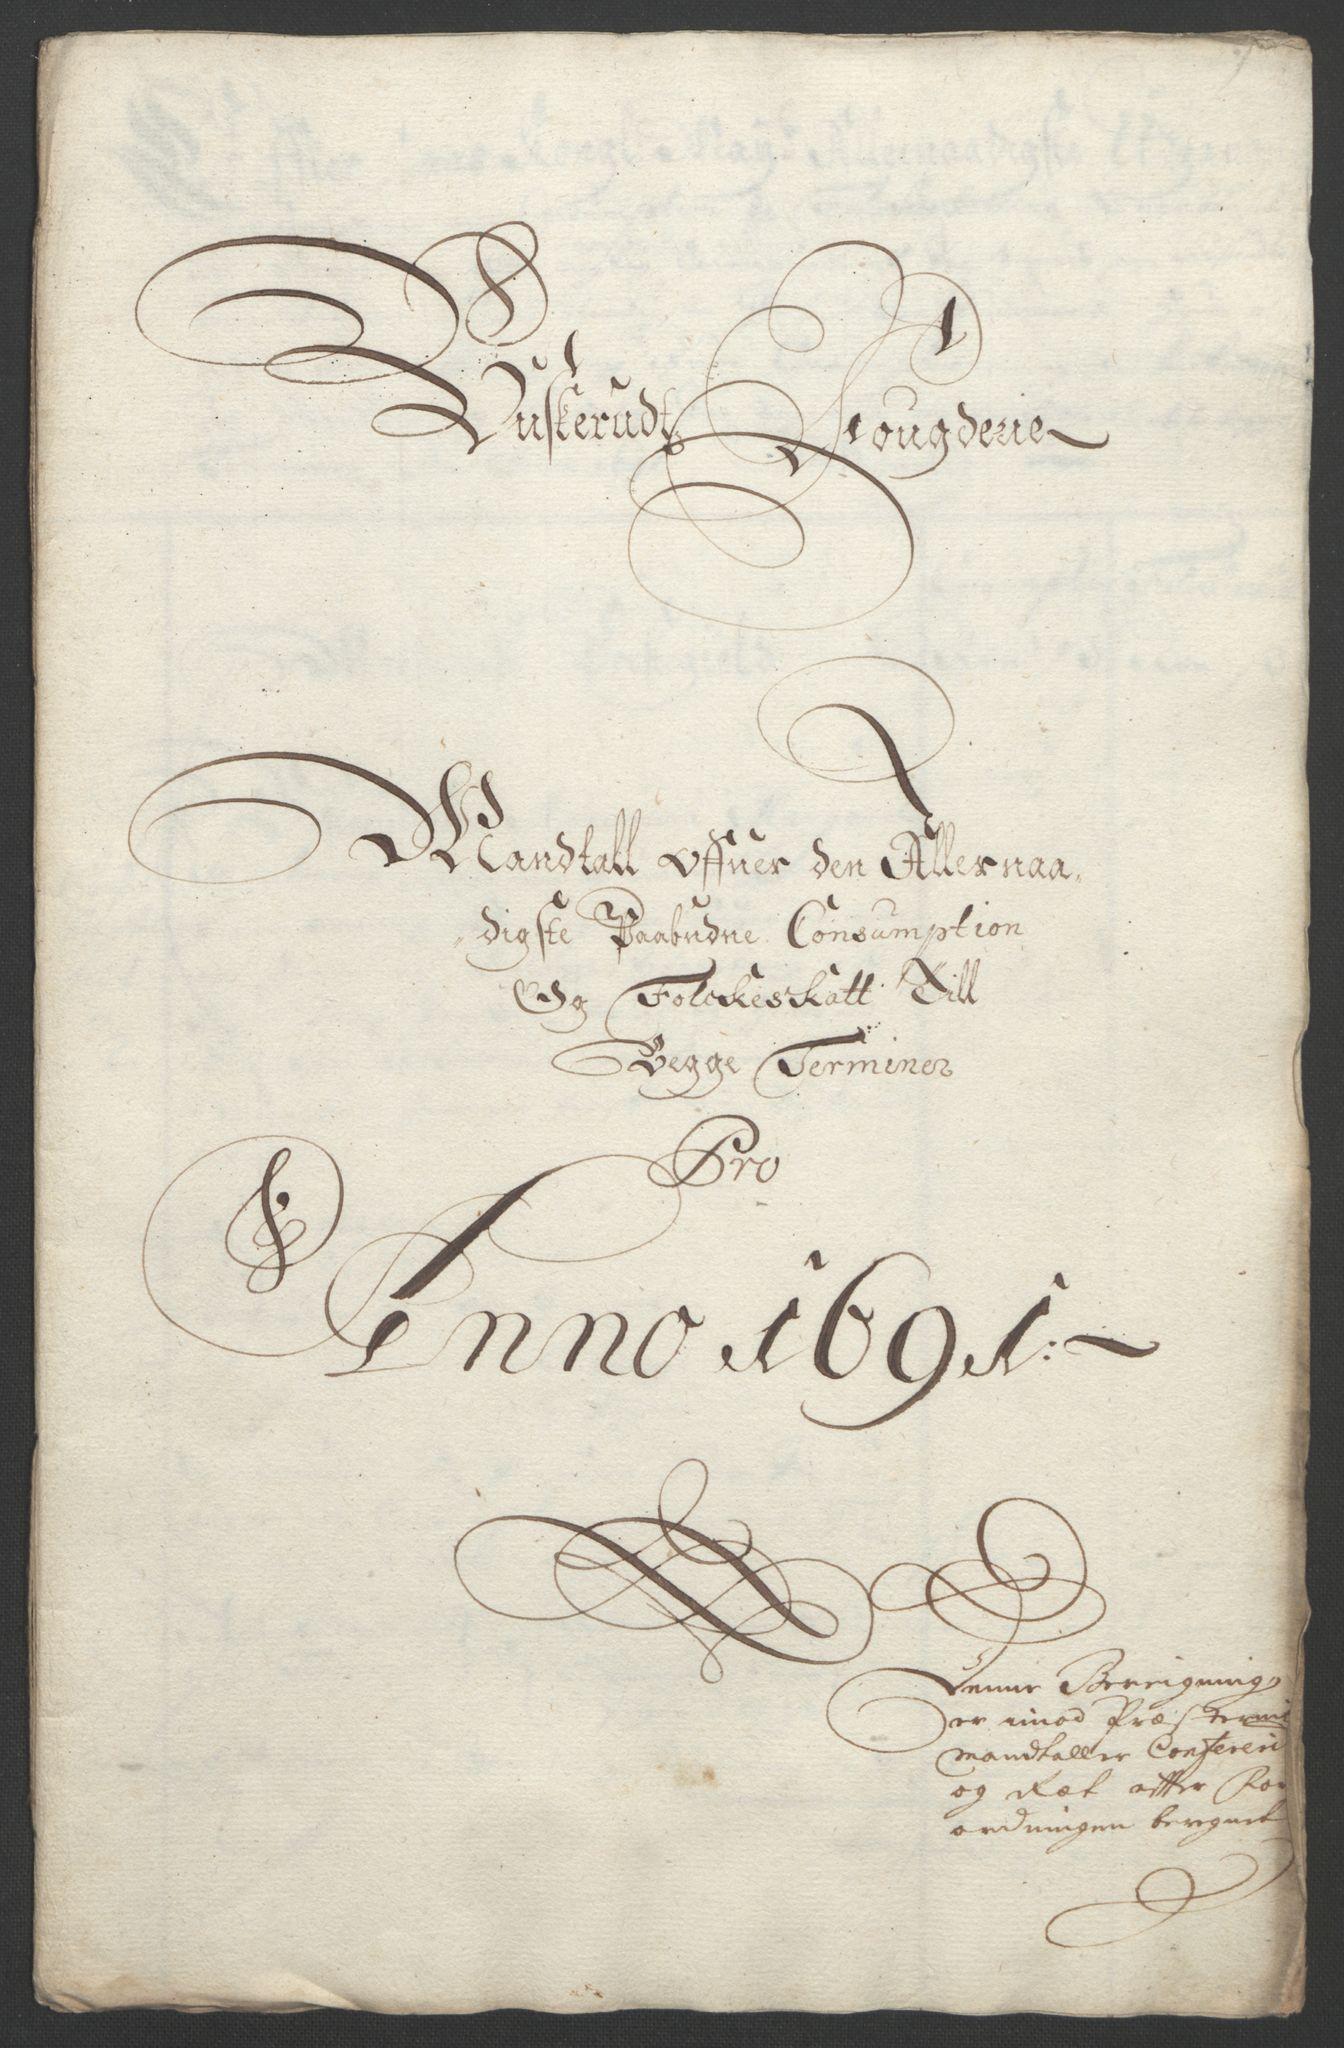 RA, Rentekammeret inntil 1814, Reviderte regnskaper, Fogderegnskap, R25/L1681: Fogderegnskap Buskerud, 1691-1692, s. 241